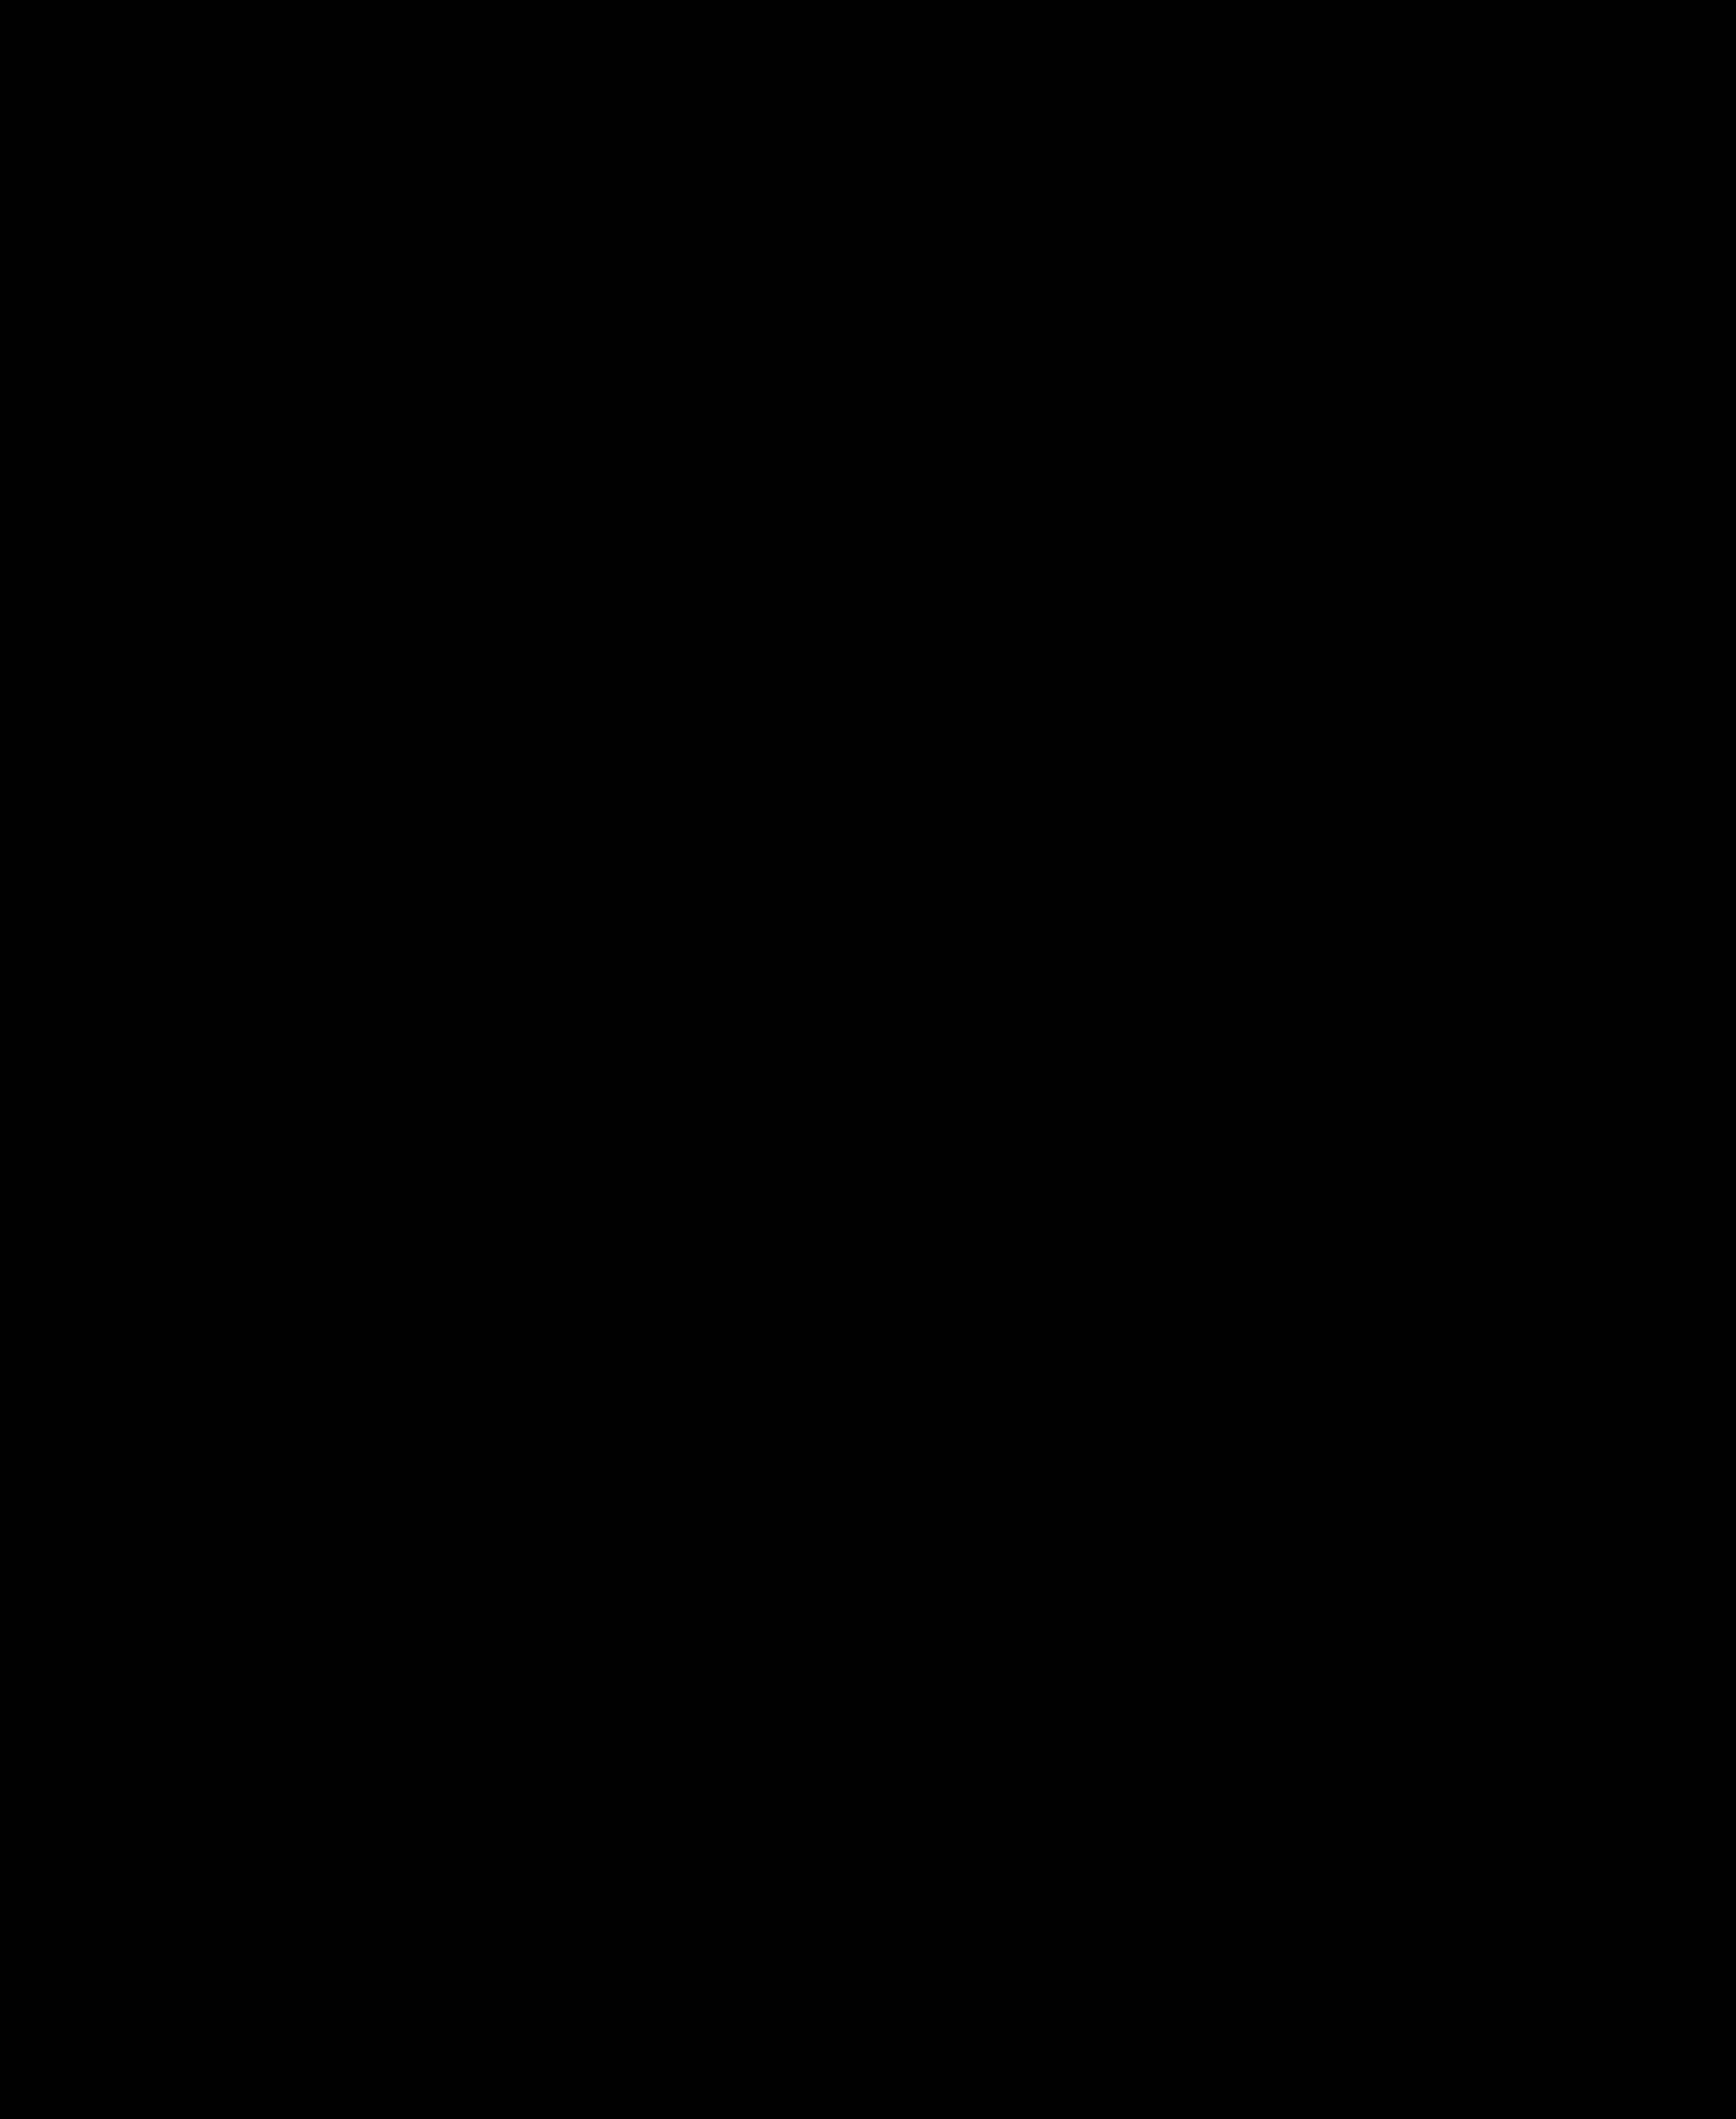 PP Recyclingcode Polypropylen